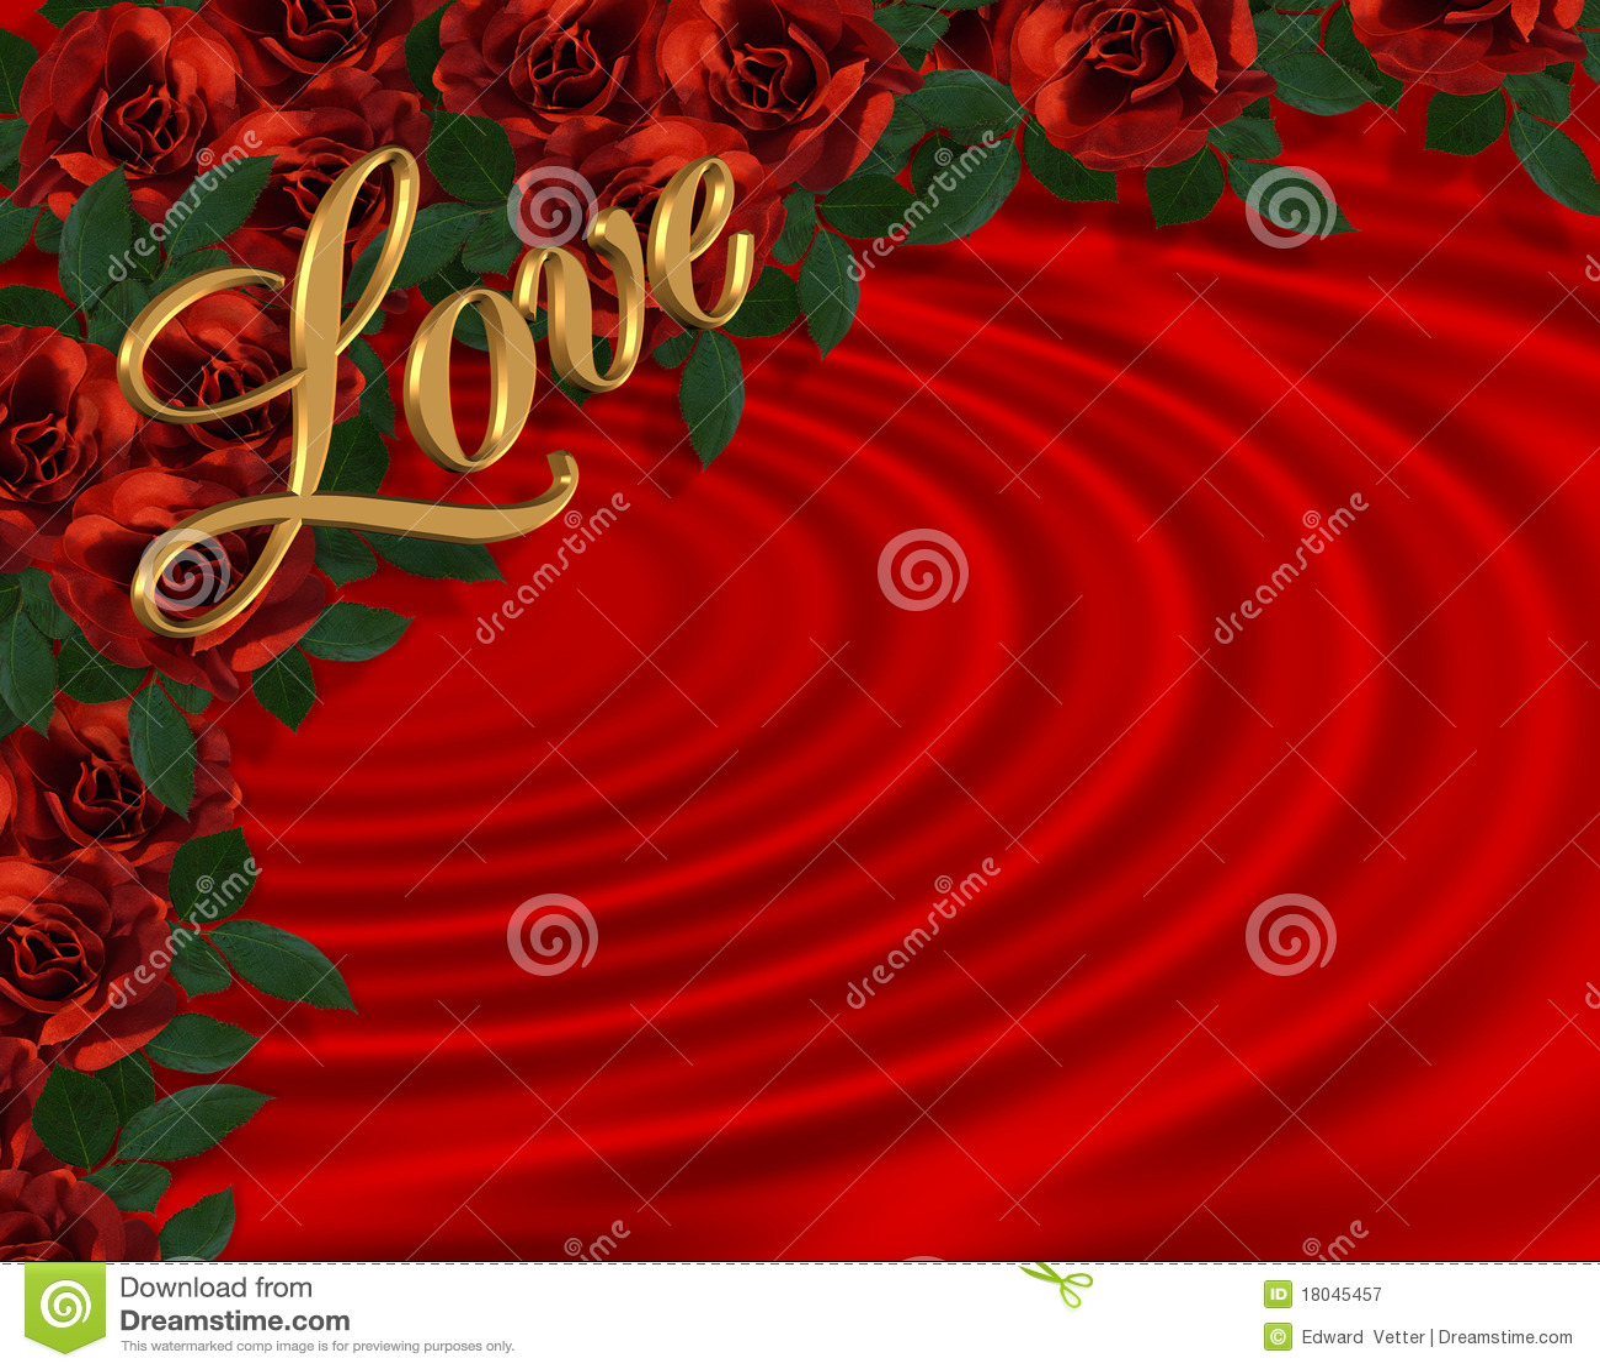 valentine border romantic red roses royalty free stock